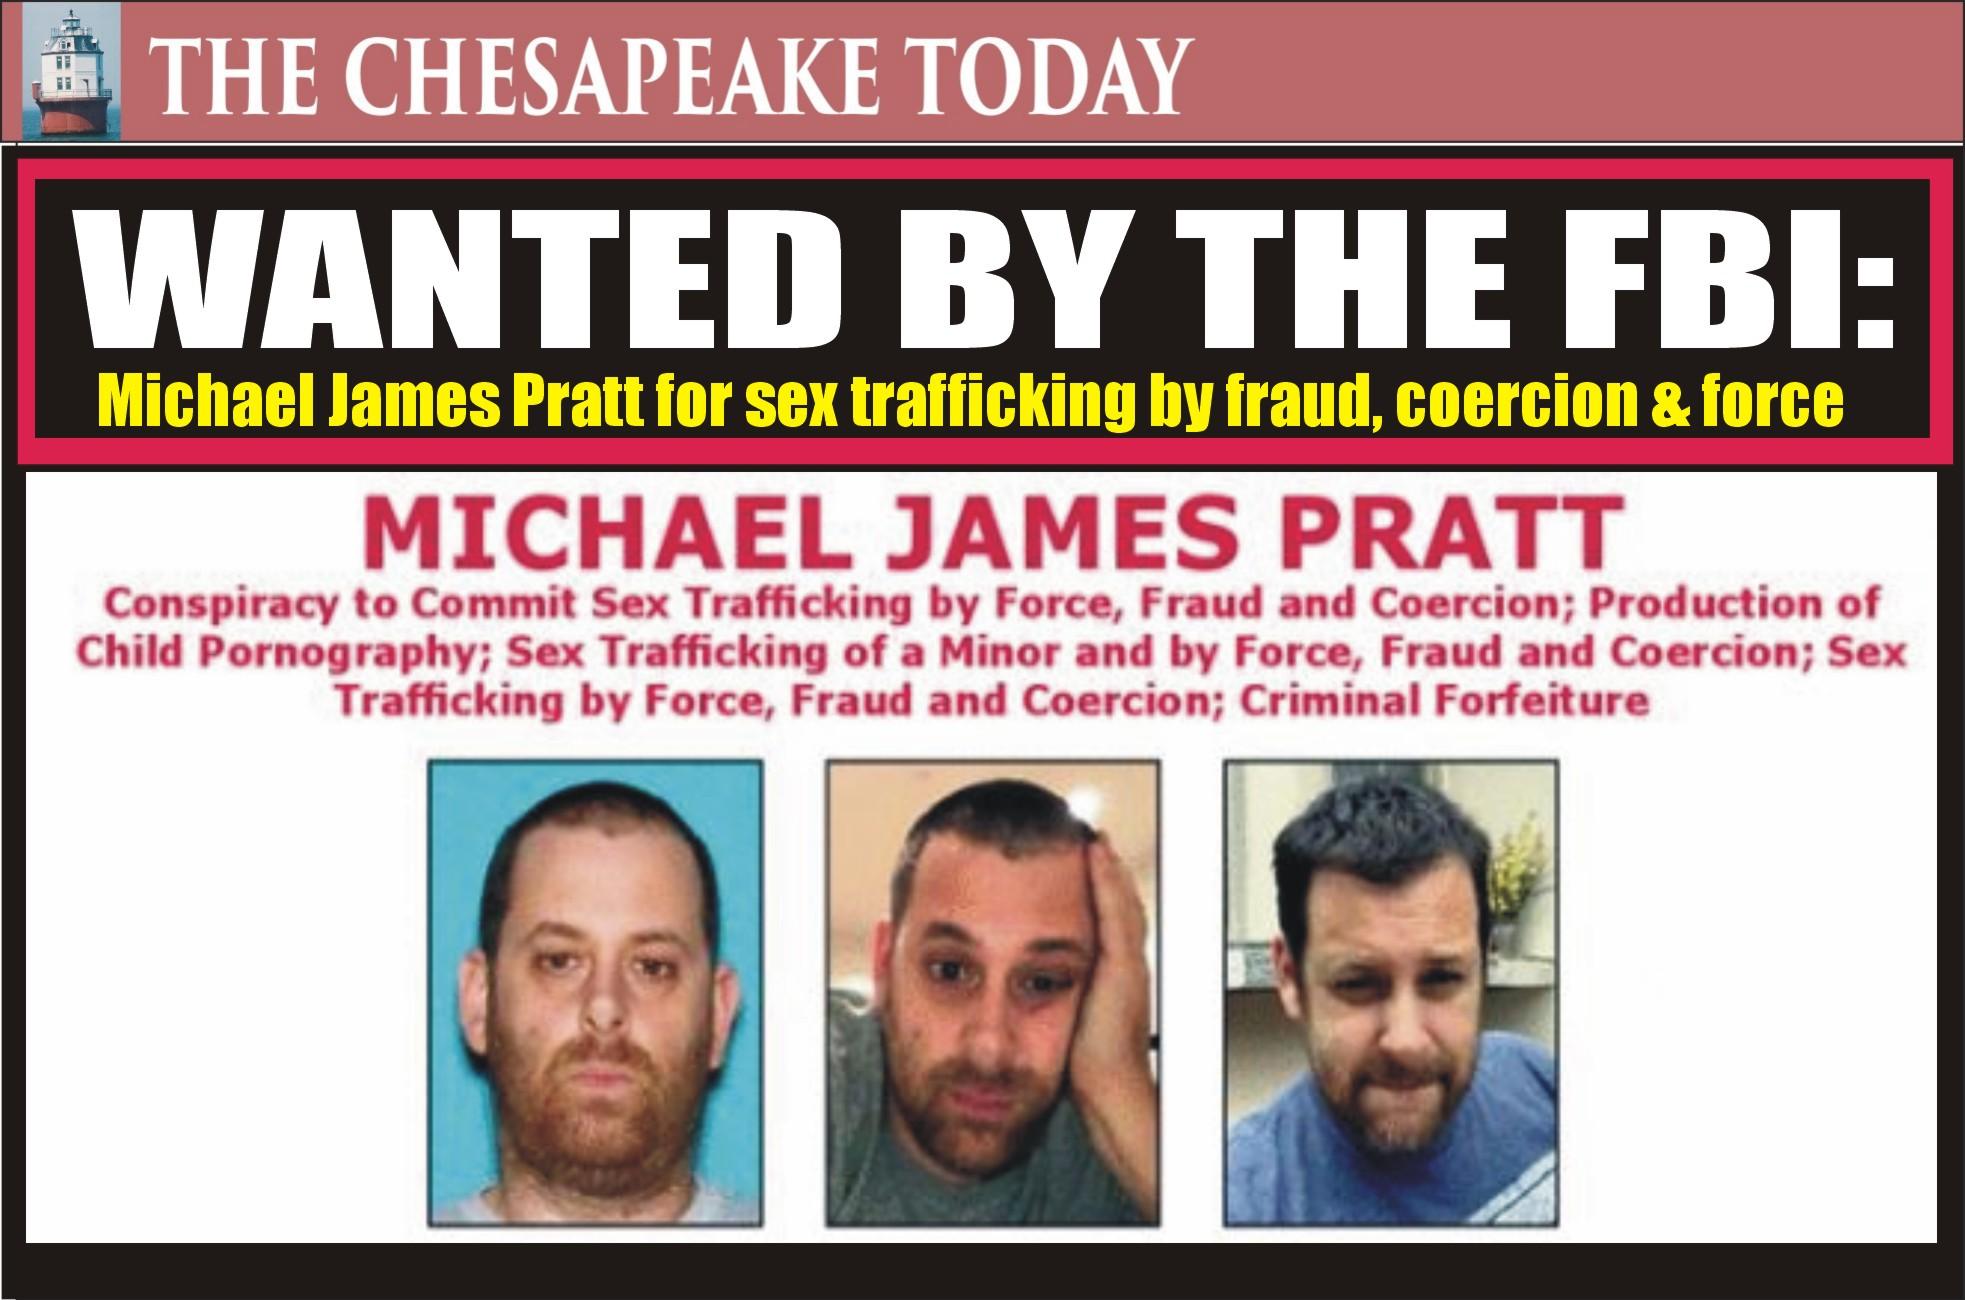 WANTED BY THE FBI: Michael James Pratt